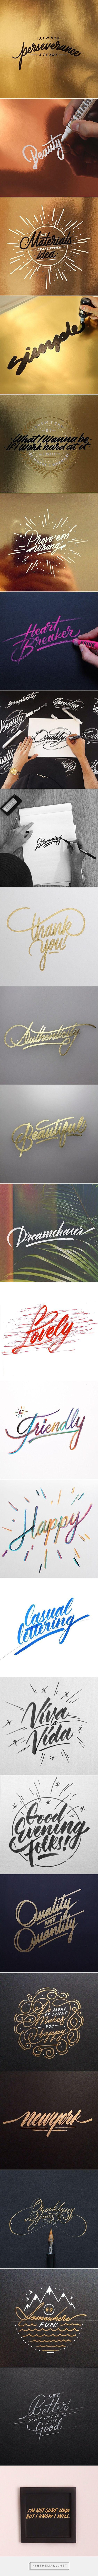 https://www.behance.net/gallery/22245751/2014-letteringcalligraphy-selection